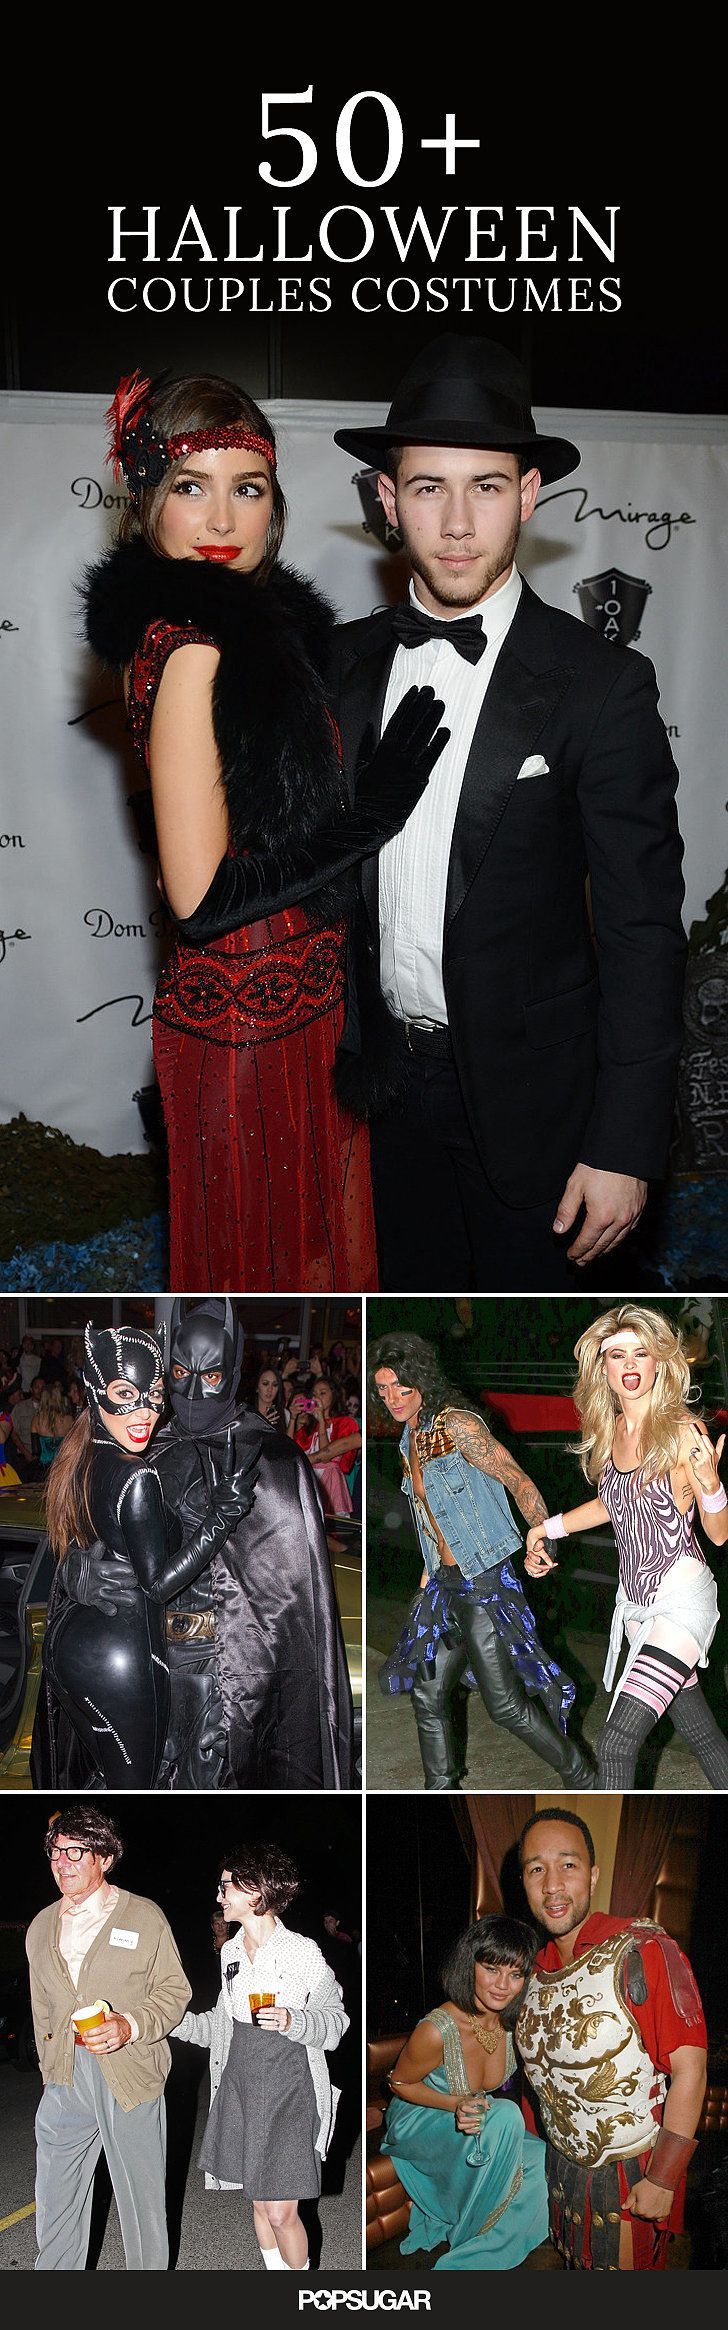 55+ Celebrity Couples Halloween Costumes